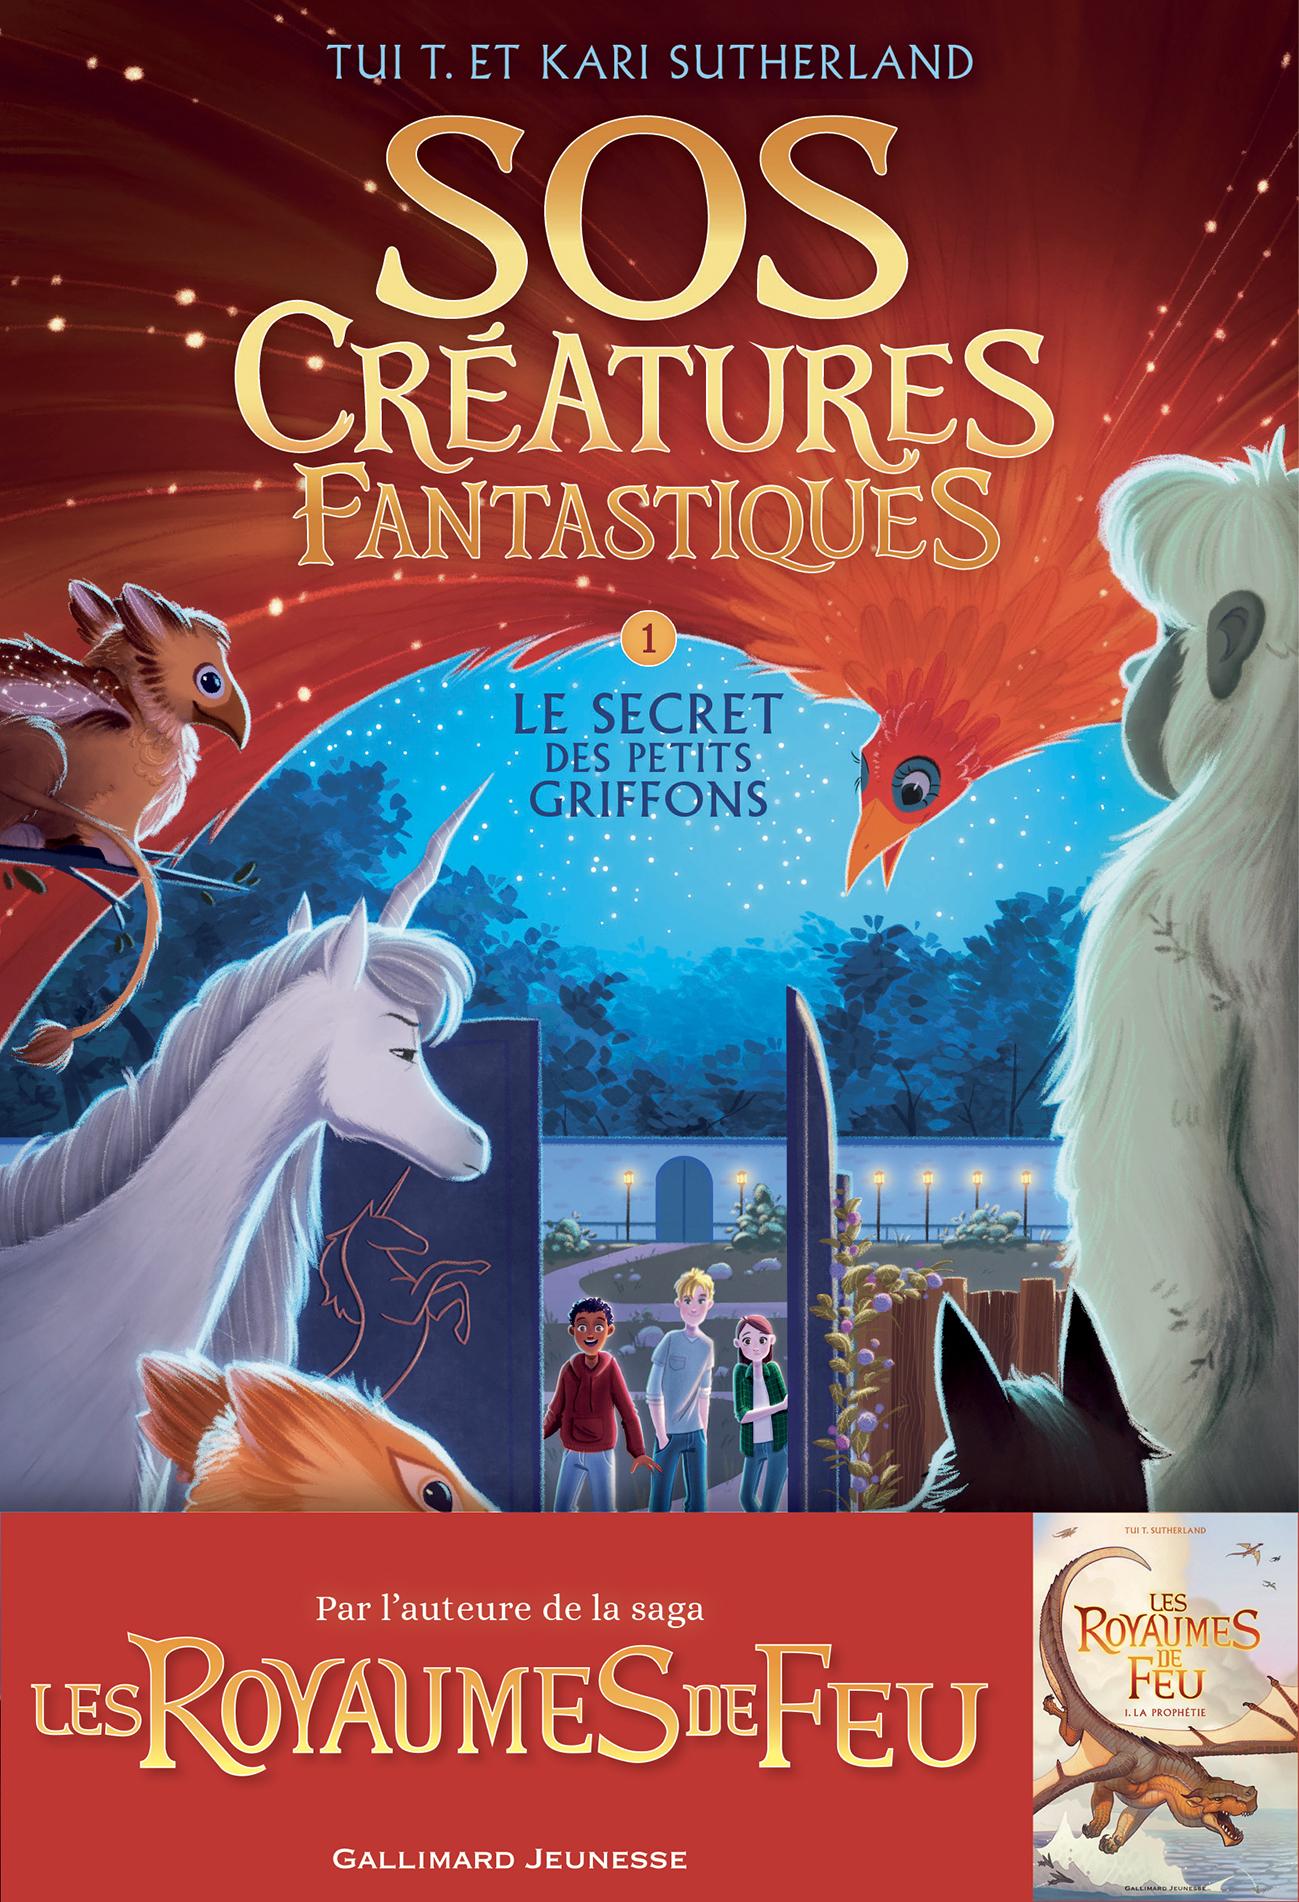 SOS CREATURES FANTASTIQUES (TOME 1-LE SECRET DES PETITS GRIFFONS)